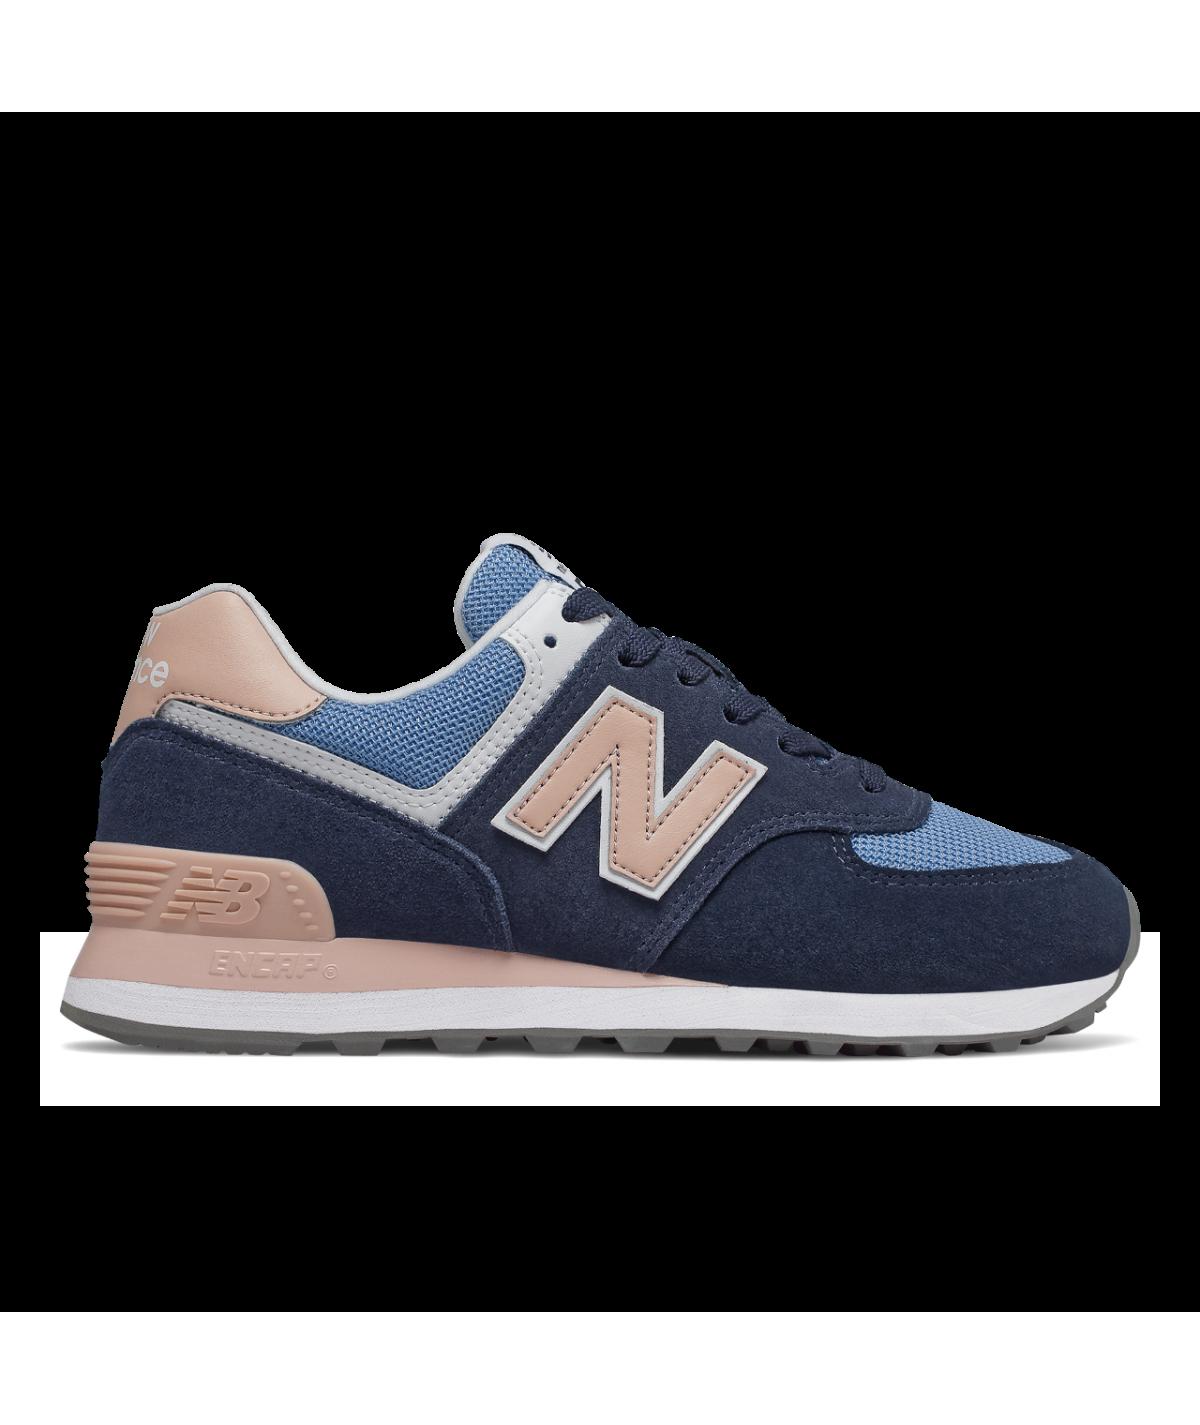 Buy New Balance 574 WND-Sneaker damen blau rosa